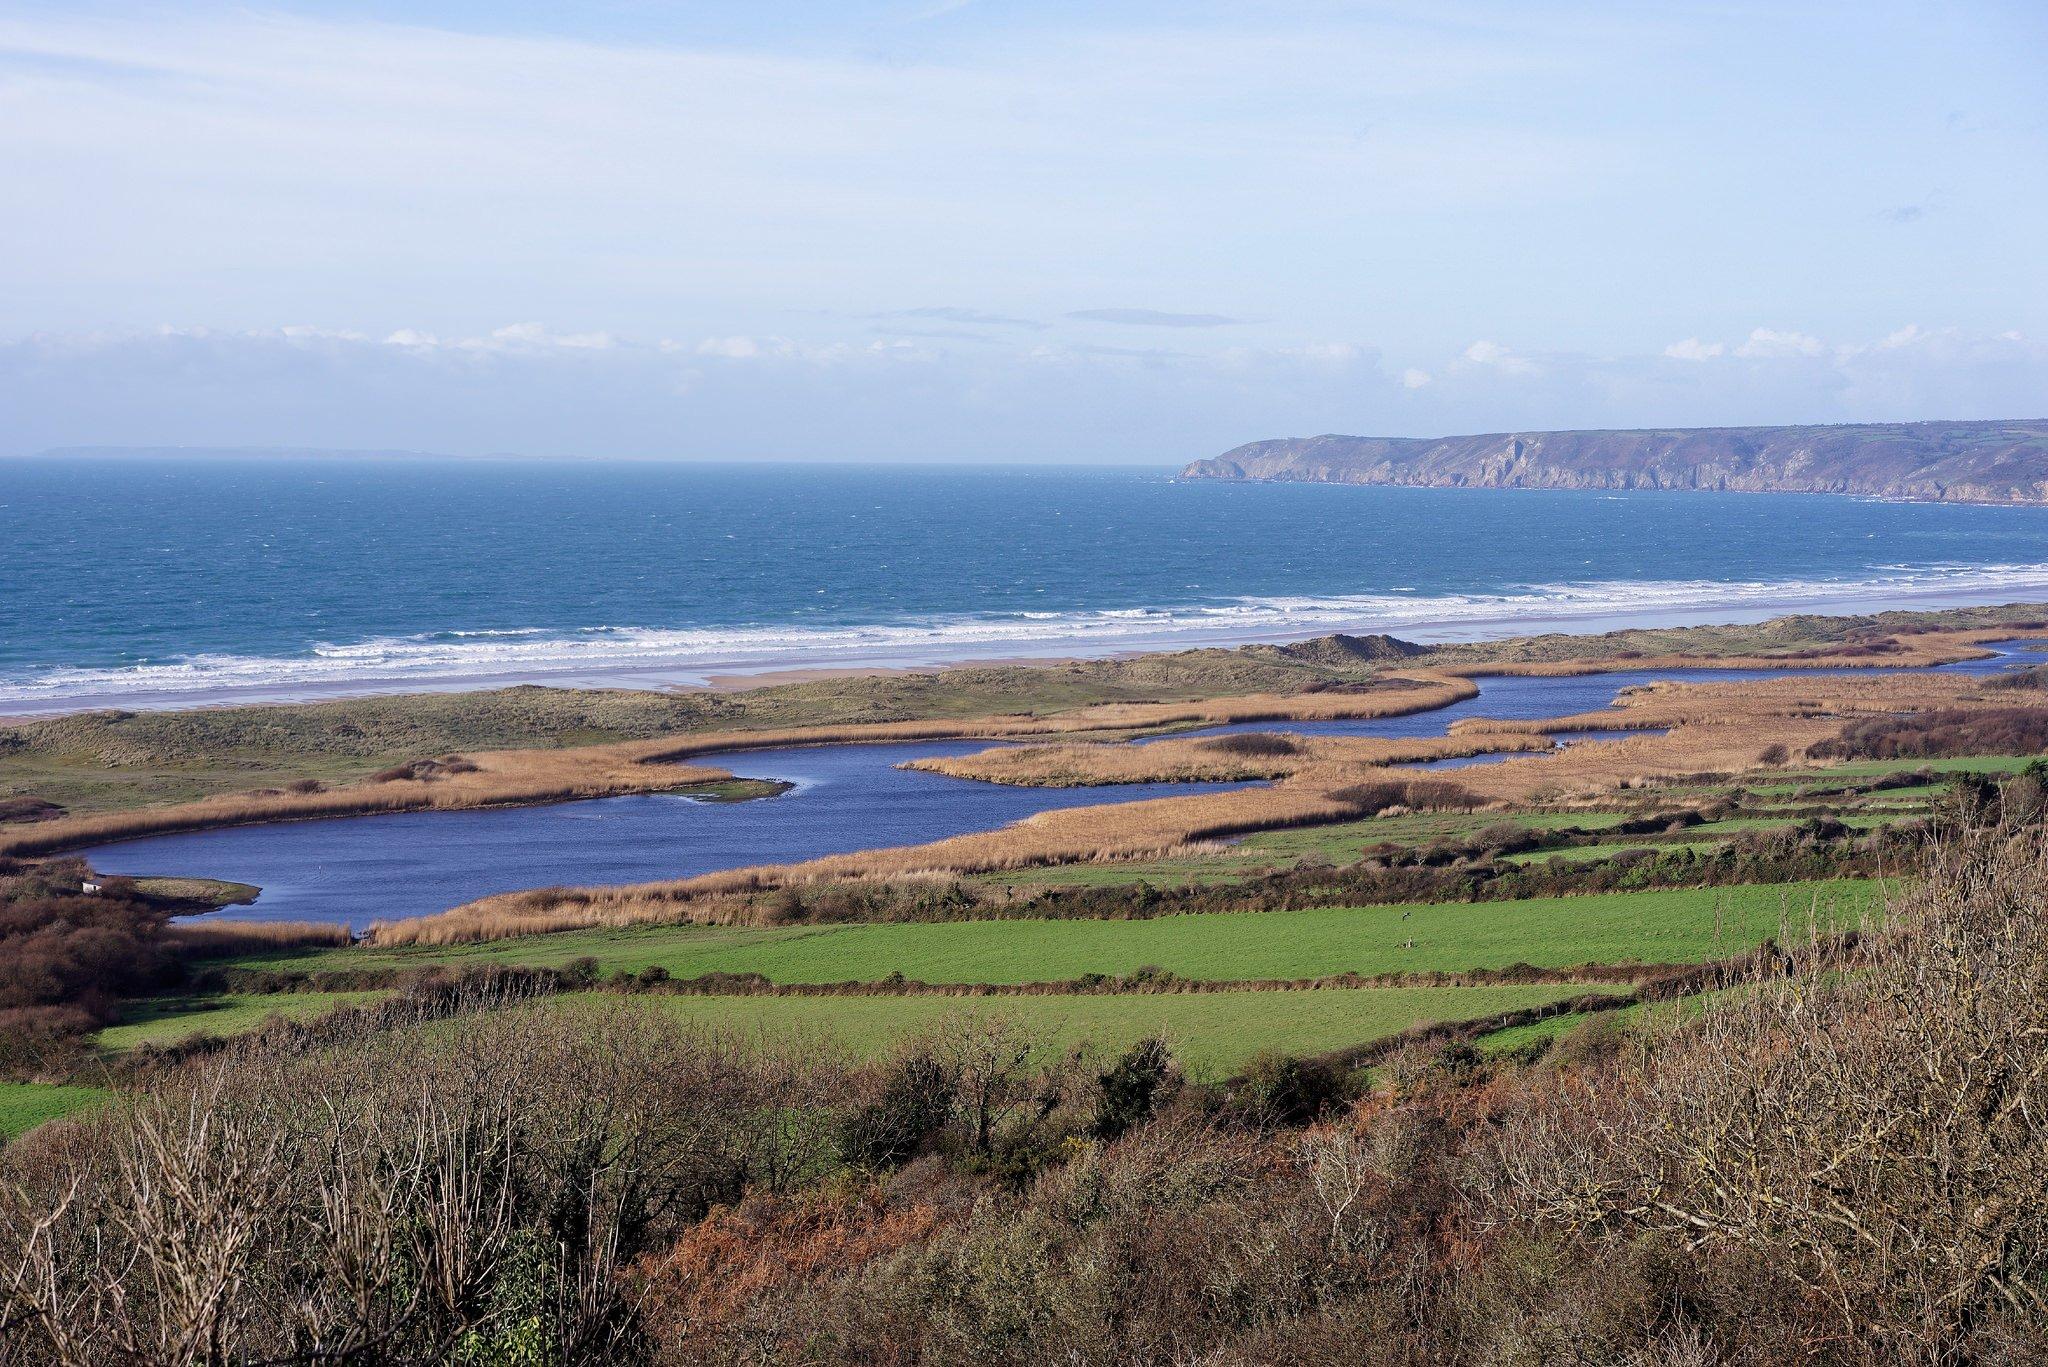 La manche territoire durable normandie voyage scolaire for Agence paysage grenoble